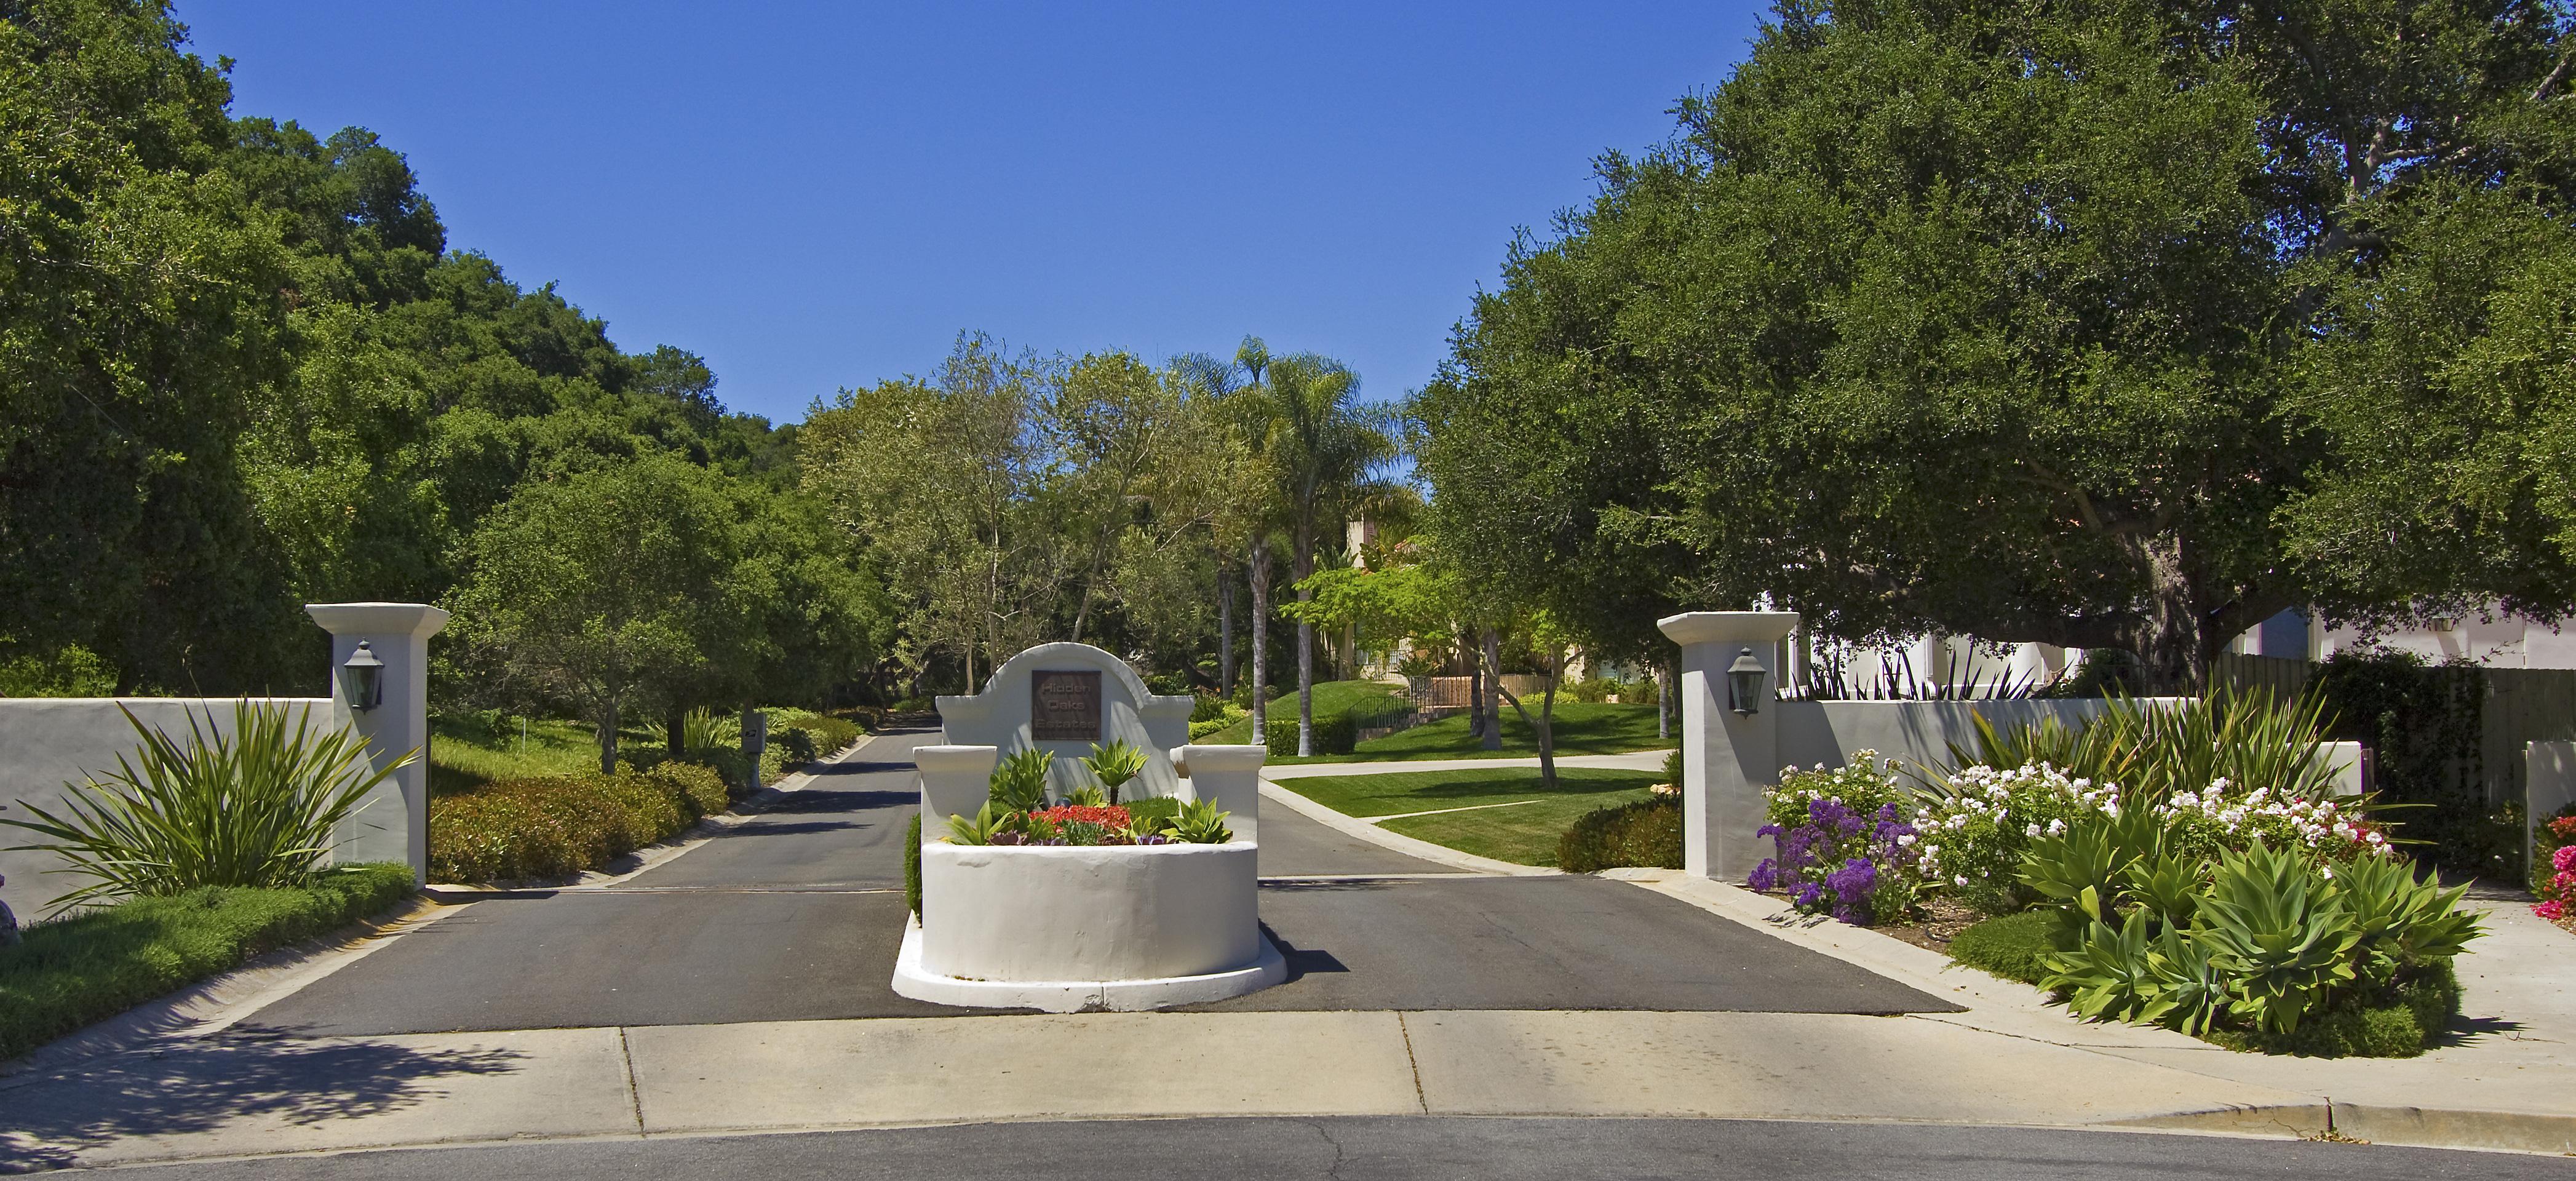 entrance gate of luxury community in santa barbara, santa barbara neighborhood